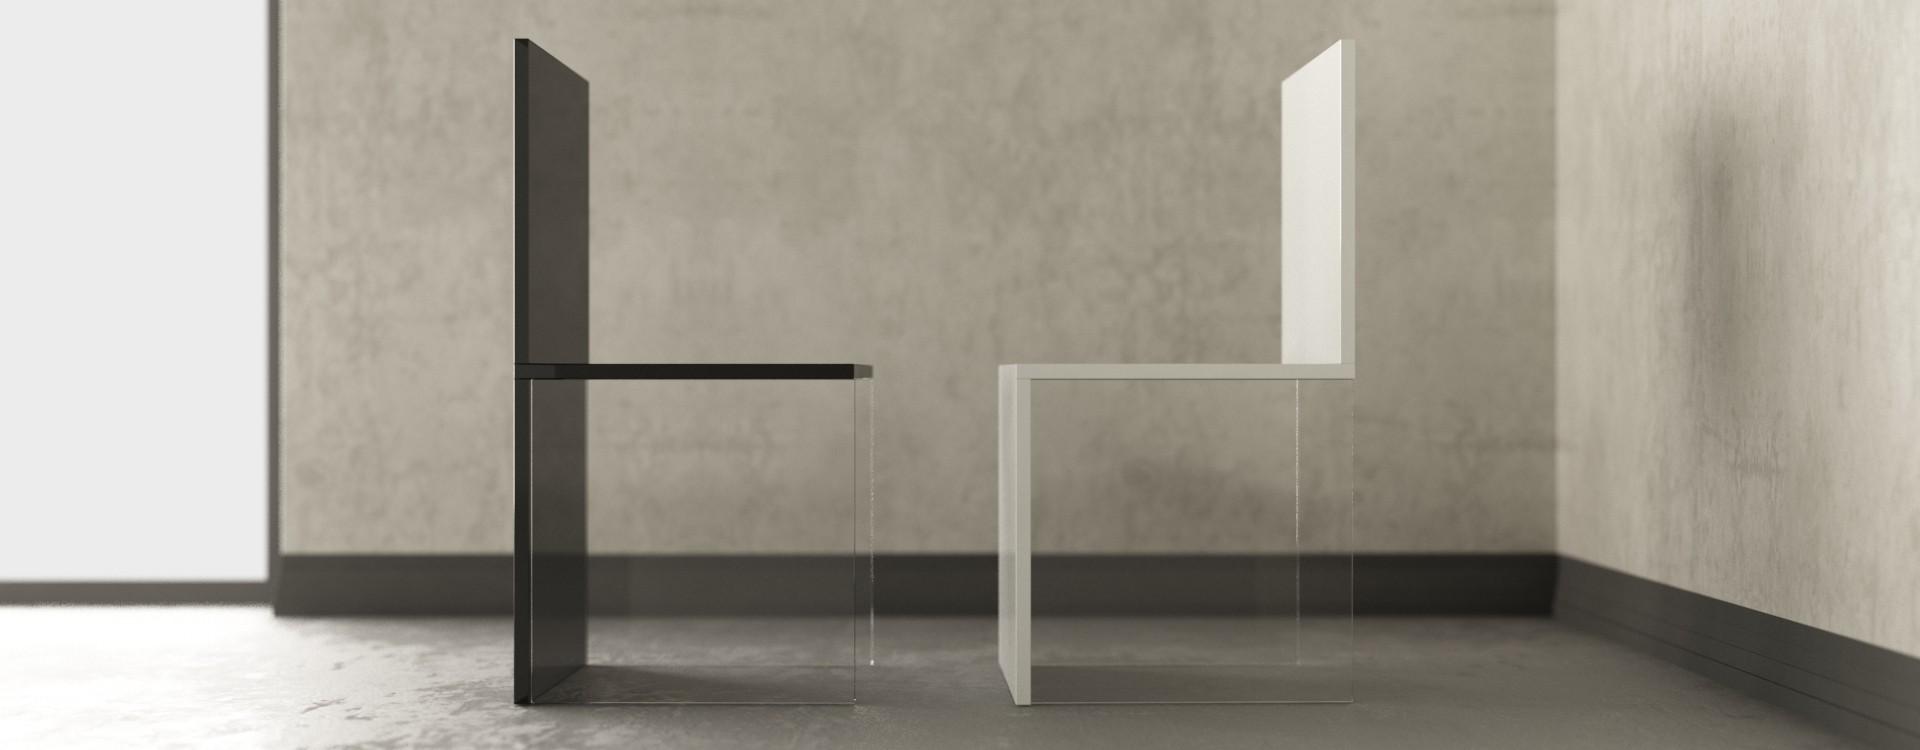 "Cadeiras ""Magica"" e ""Magica2"" / Davide Conti Design Studio, Cortesia de Davide Conti"